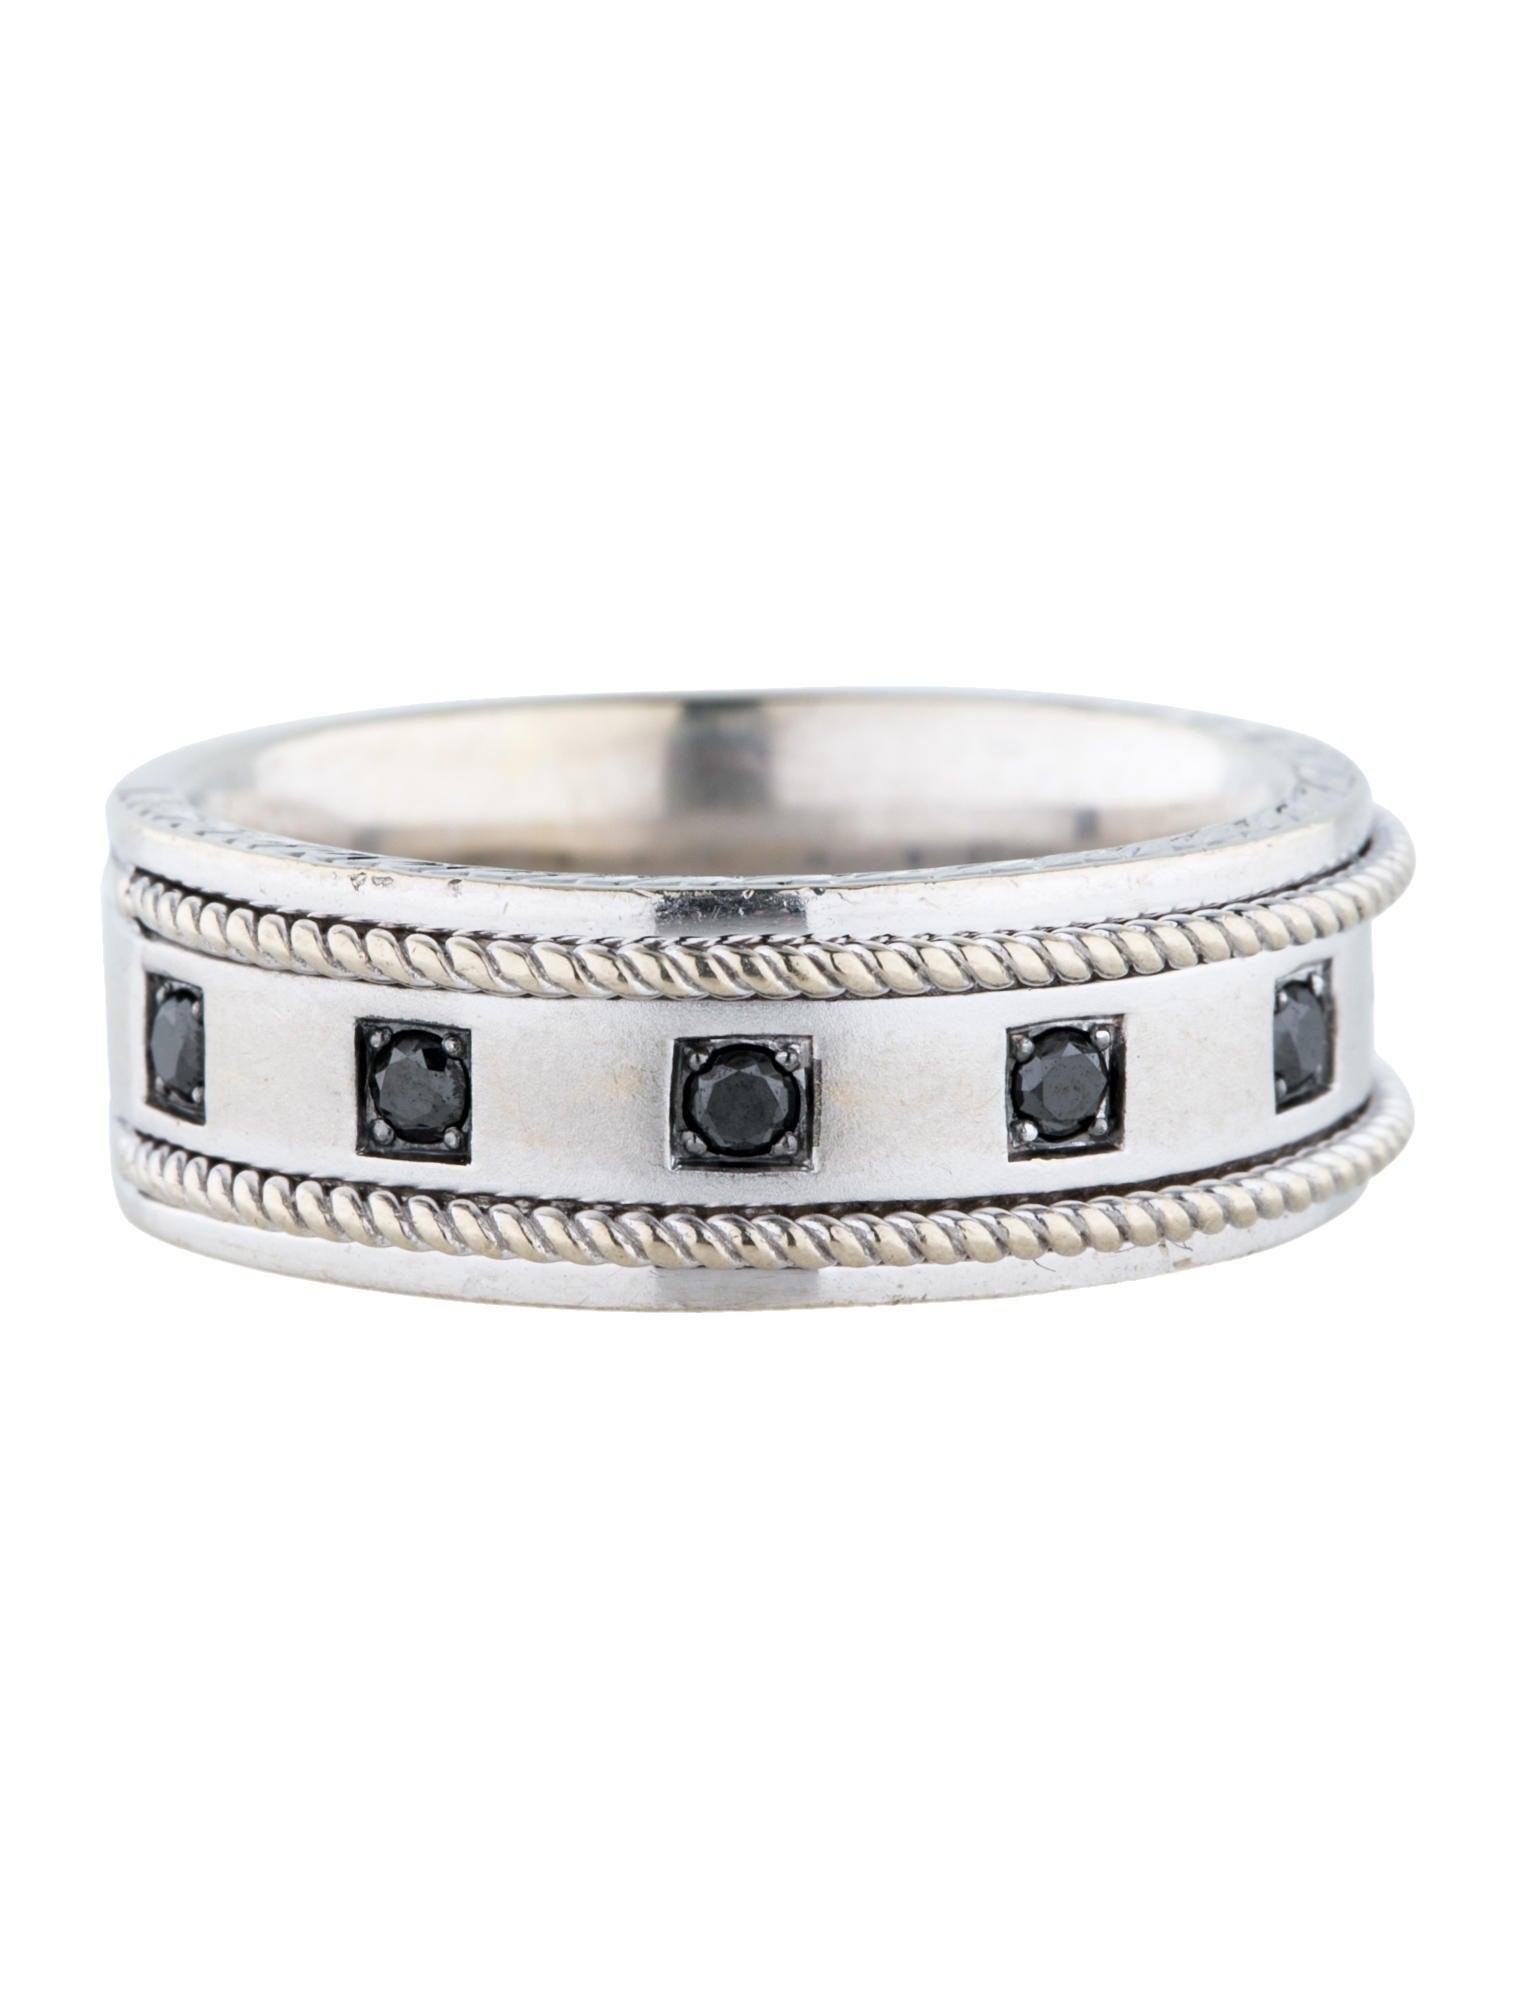 neil lane 14k black diamond band rings nln20012 the realreal